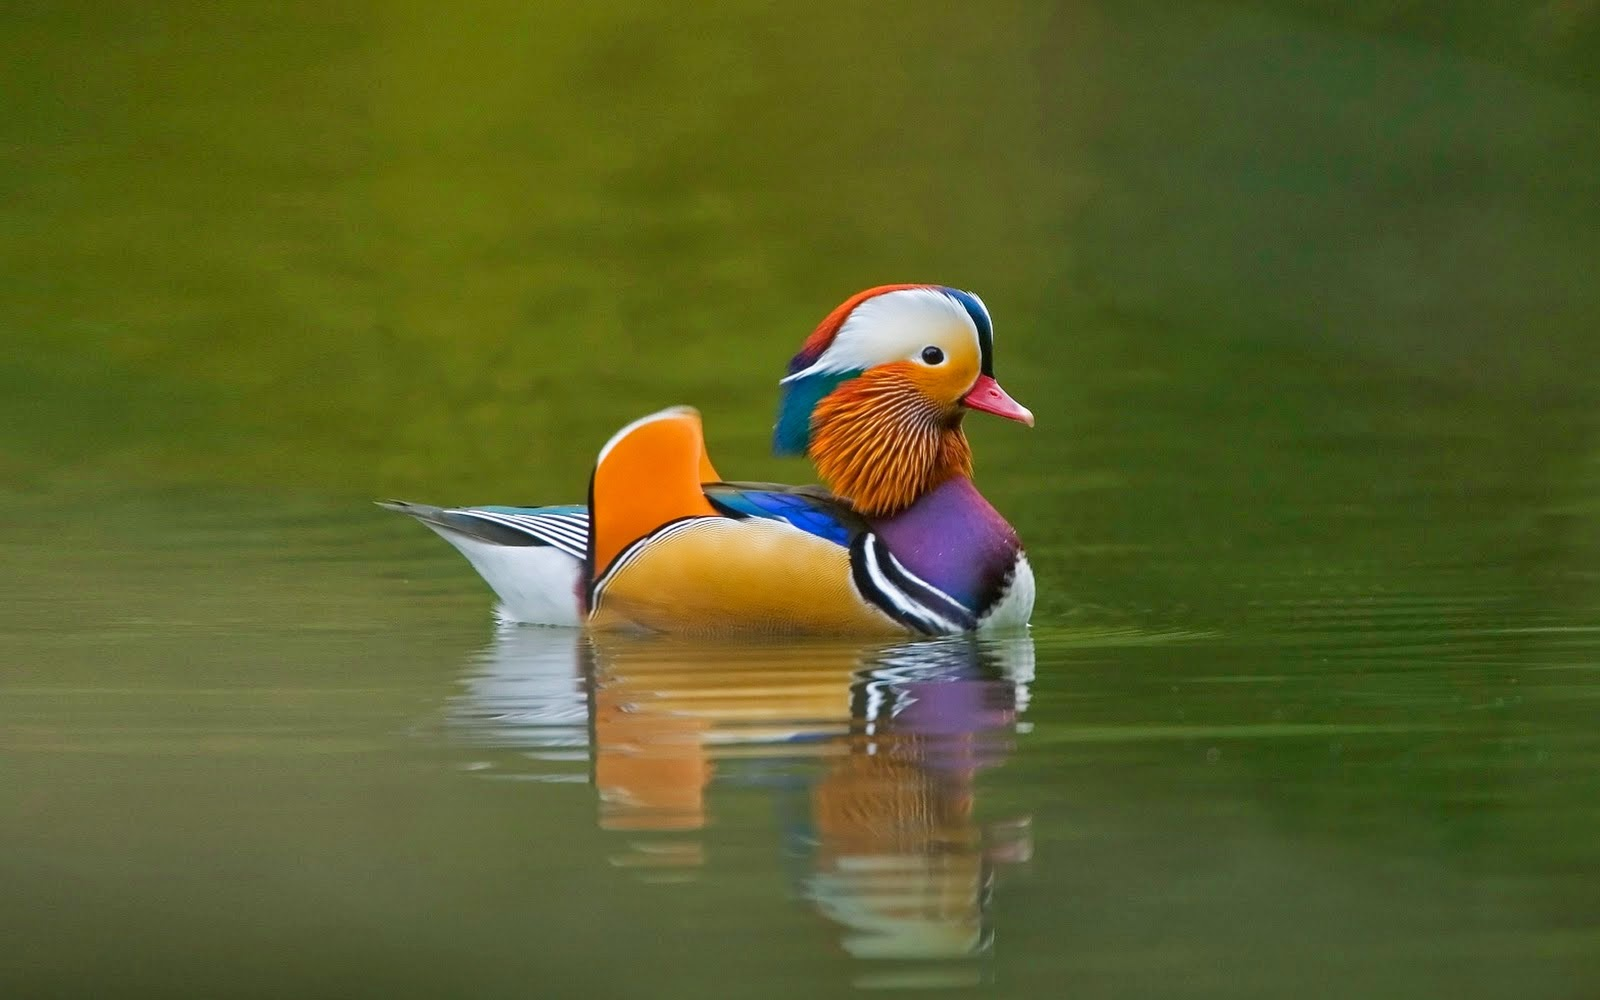 Beautiful birds pics hd for kids wallpapers parot bird - Animal and bird hd wallpaper ...